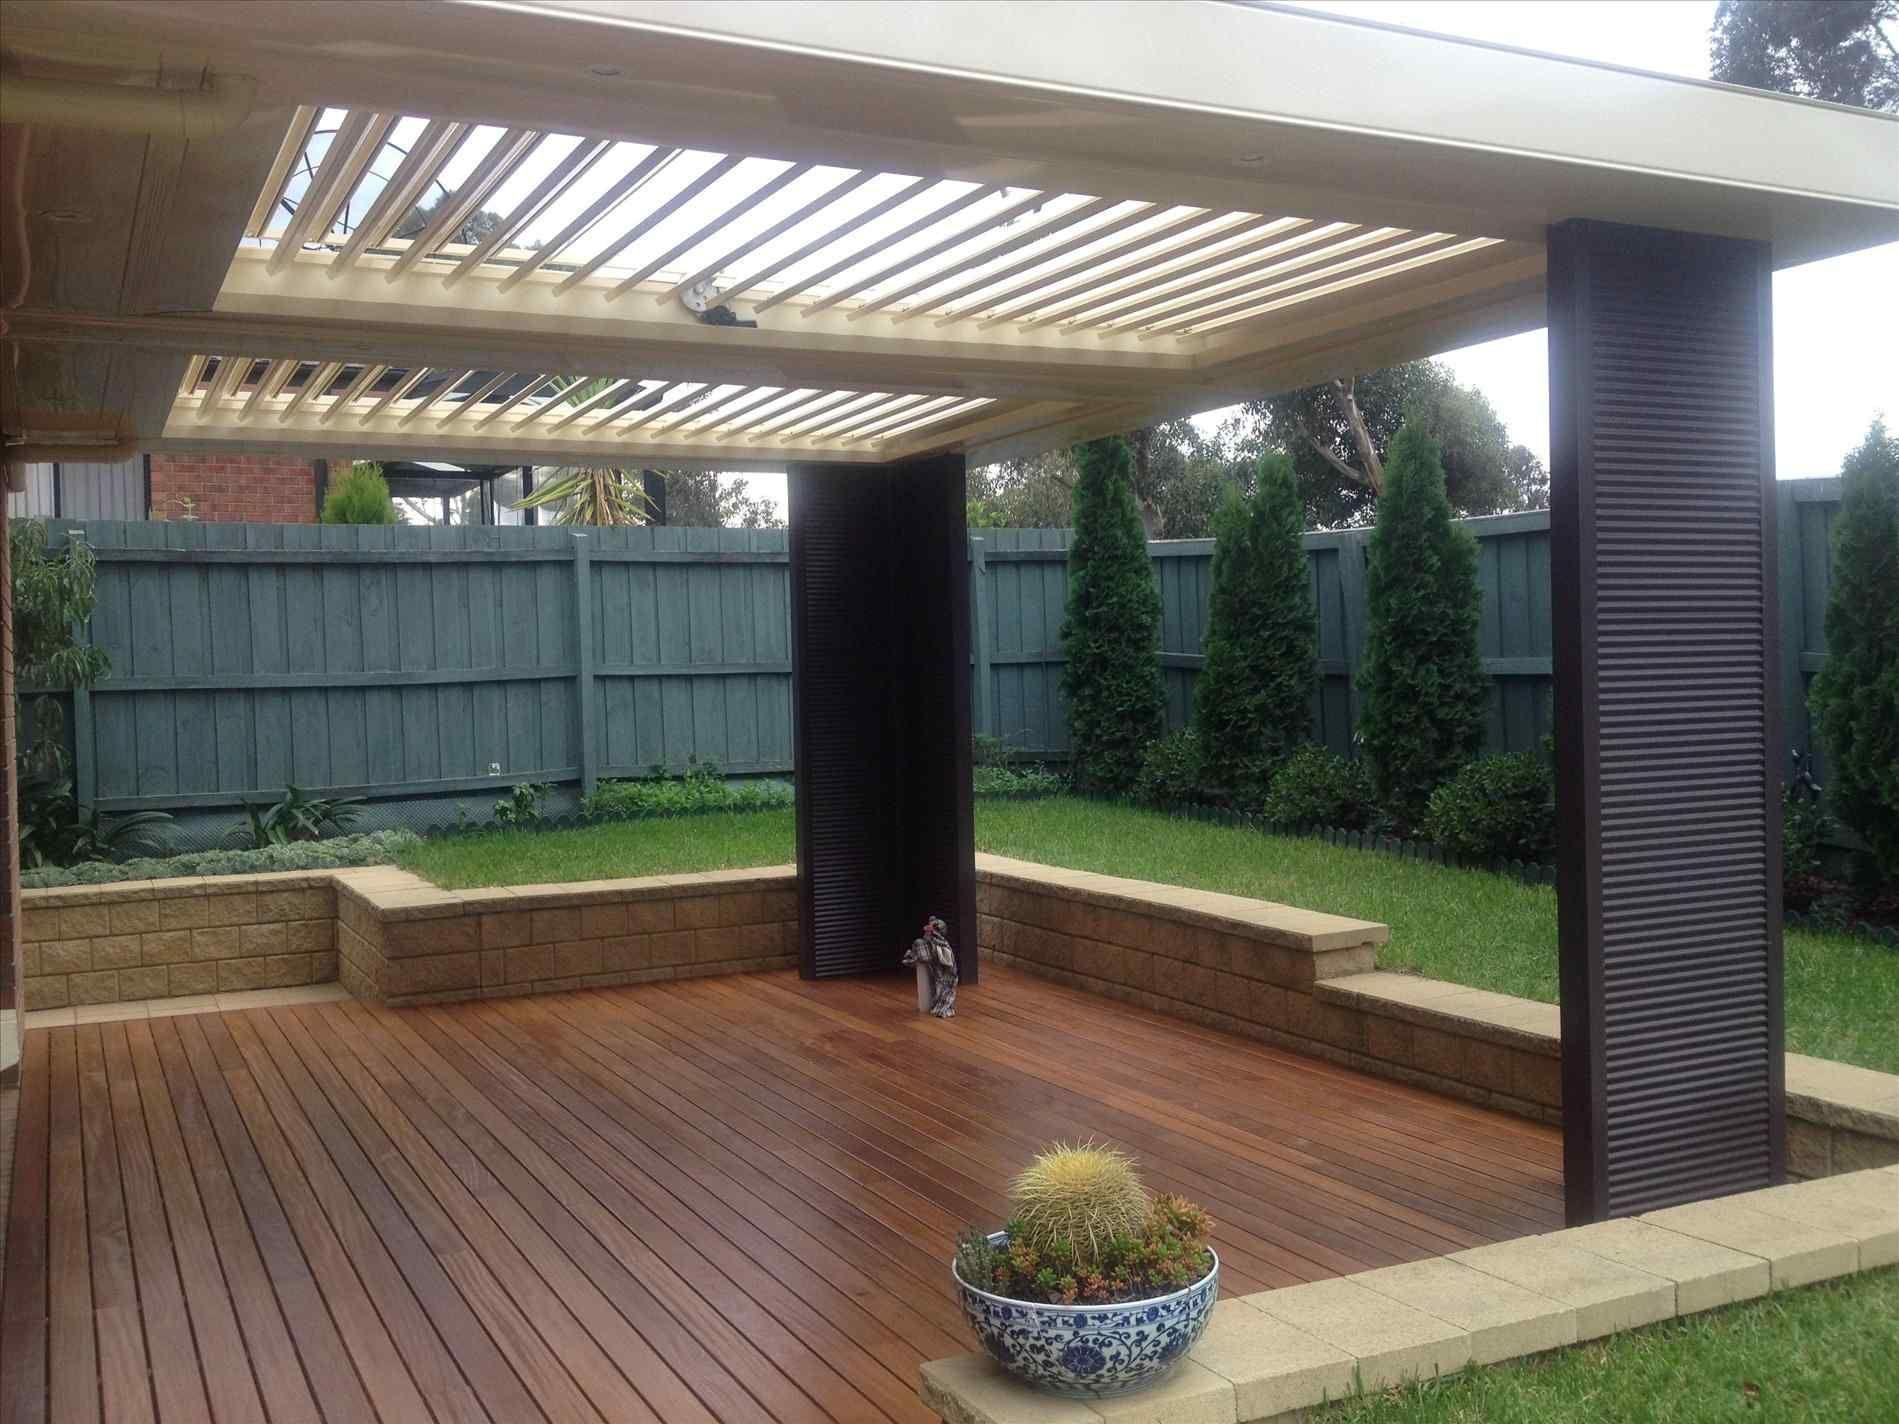 Verandah Roof Designs Home Roof Ideas Roof Design Apartment Garden House Design Photos